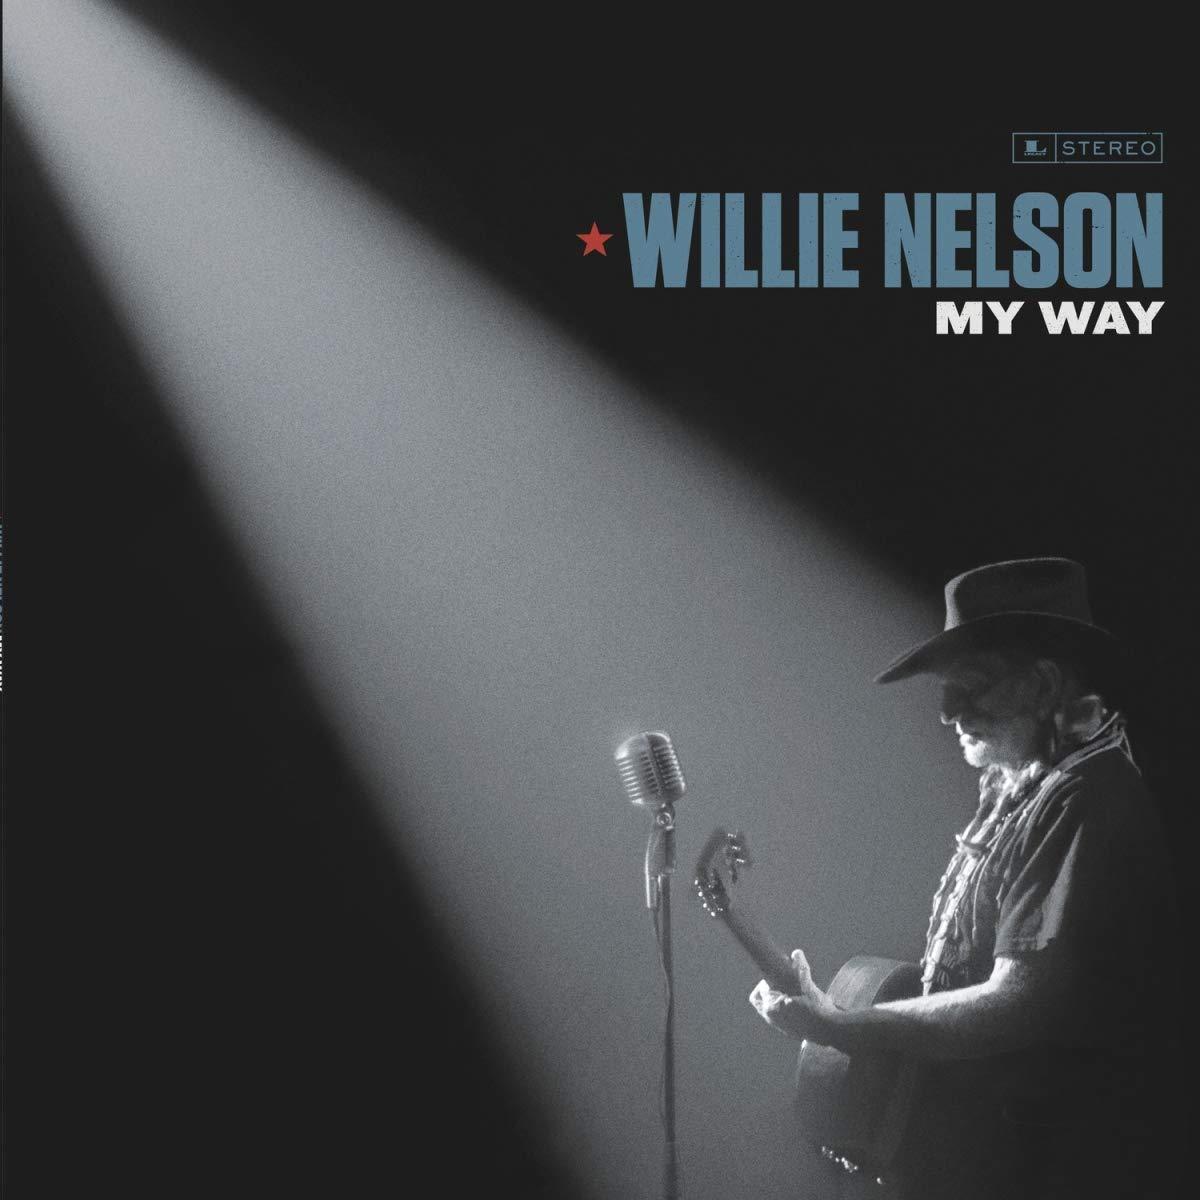 Фото - Уилли Нельсон Willie Nelson. My Way (LP) уилли нельсон willie nelson last man standing lp